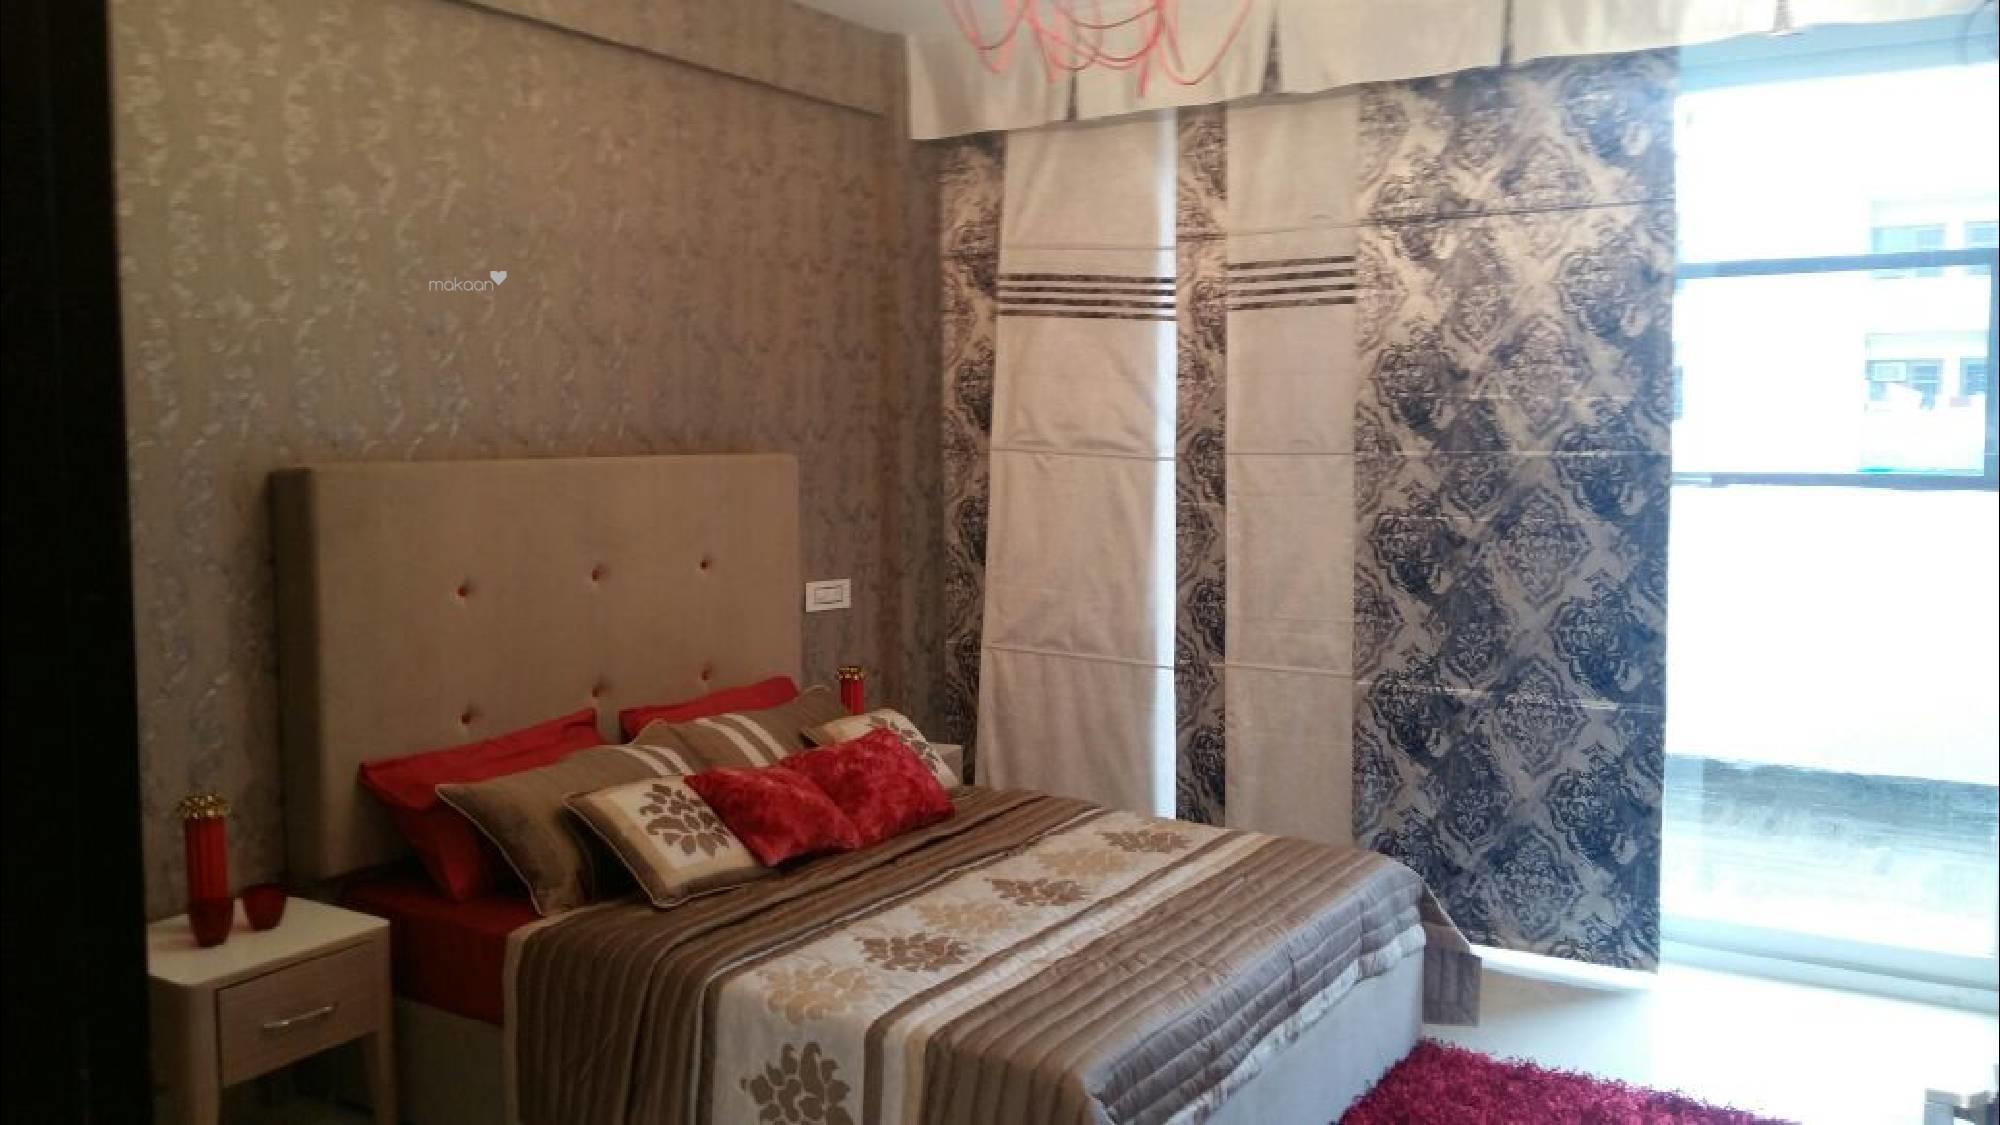 1242 sq ft 3BHK 3BHK+3T (1,242 sq ft) Property By Nirmaaninfratech In av ananta, Zirakpur GAzipur Road